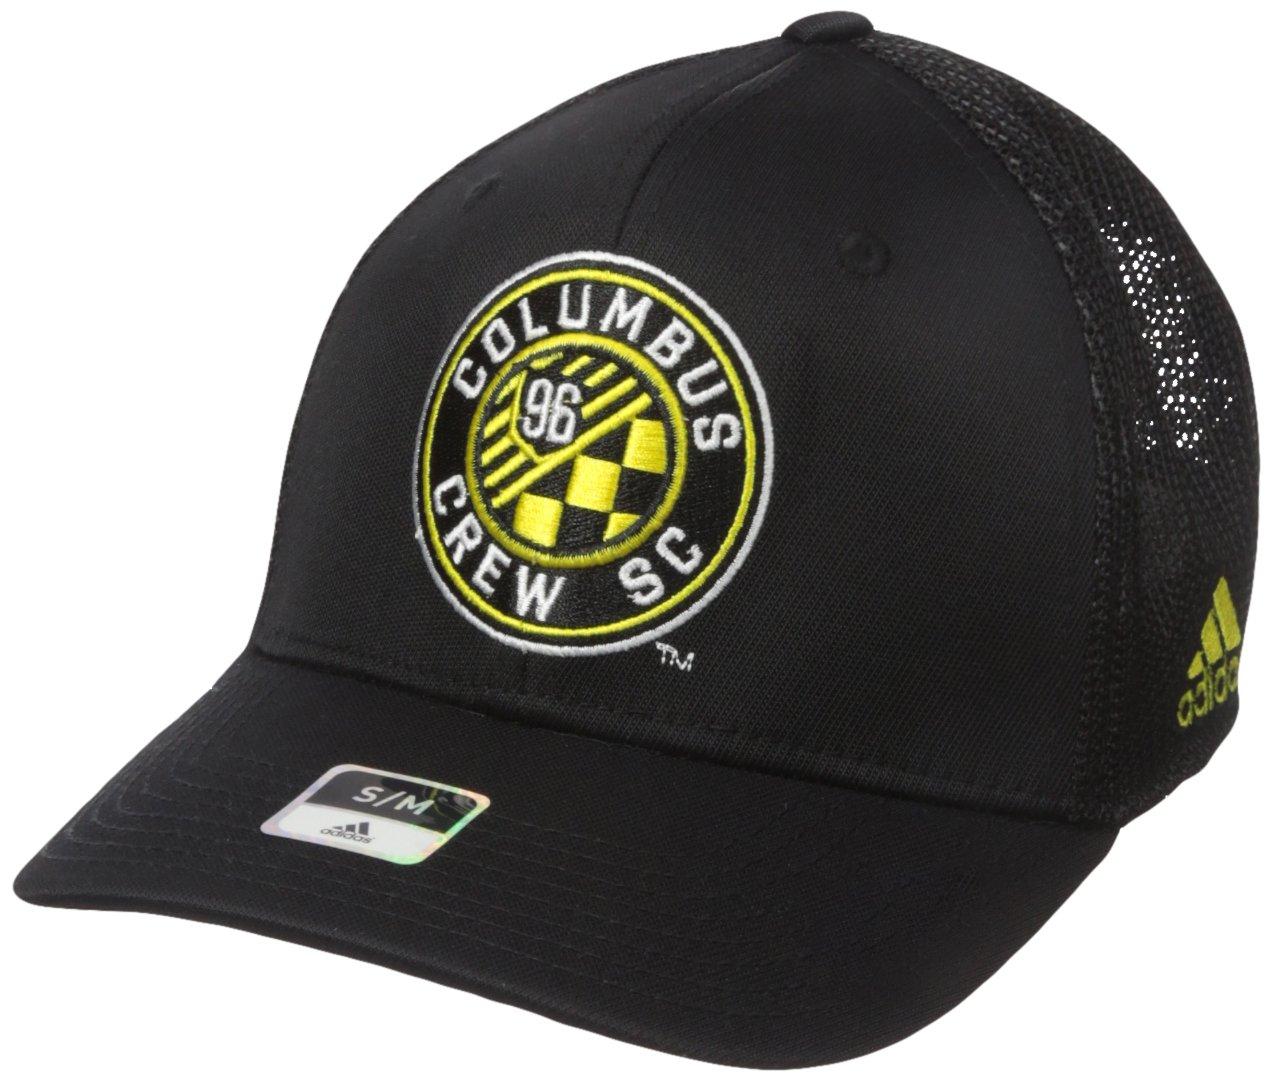 new product dde05 f8c39 Amazon.com   adidas MLS Mens MLS SP17 Fan Wear Tactel Trucker Flex Cap    Sports   Outdoors